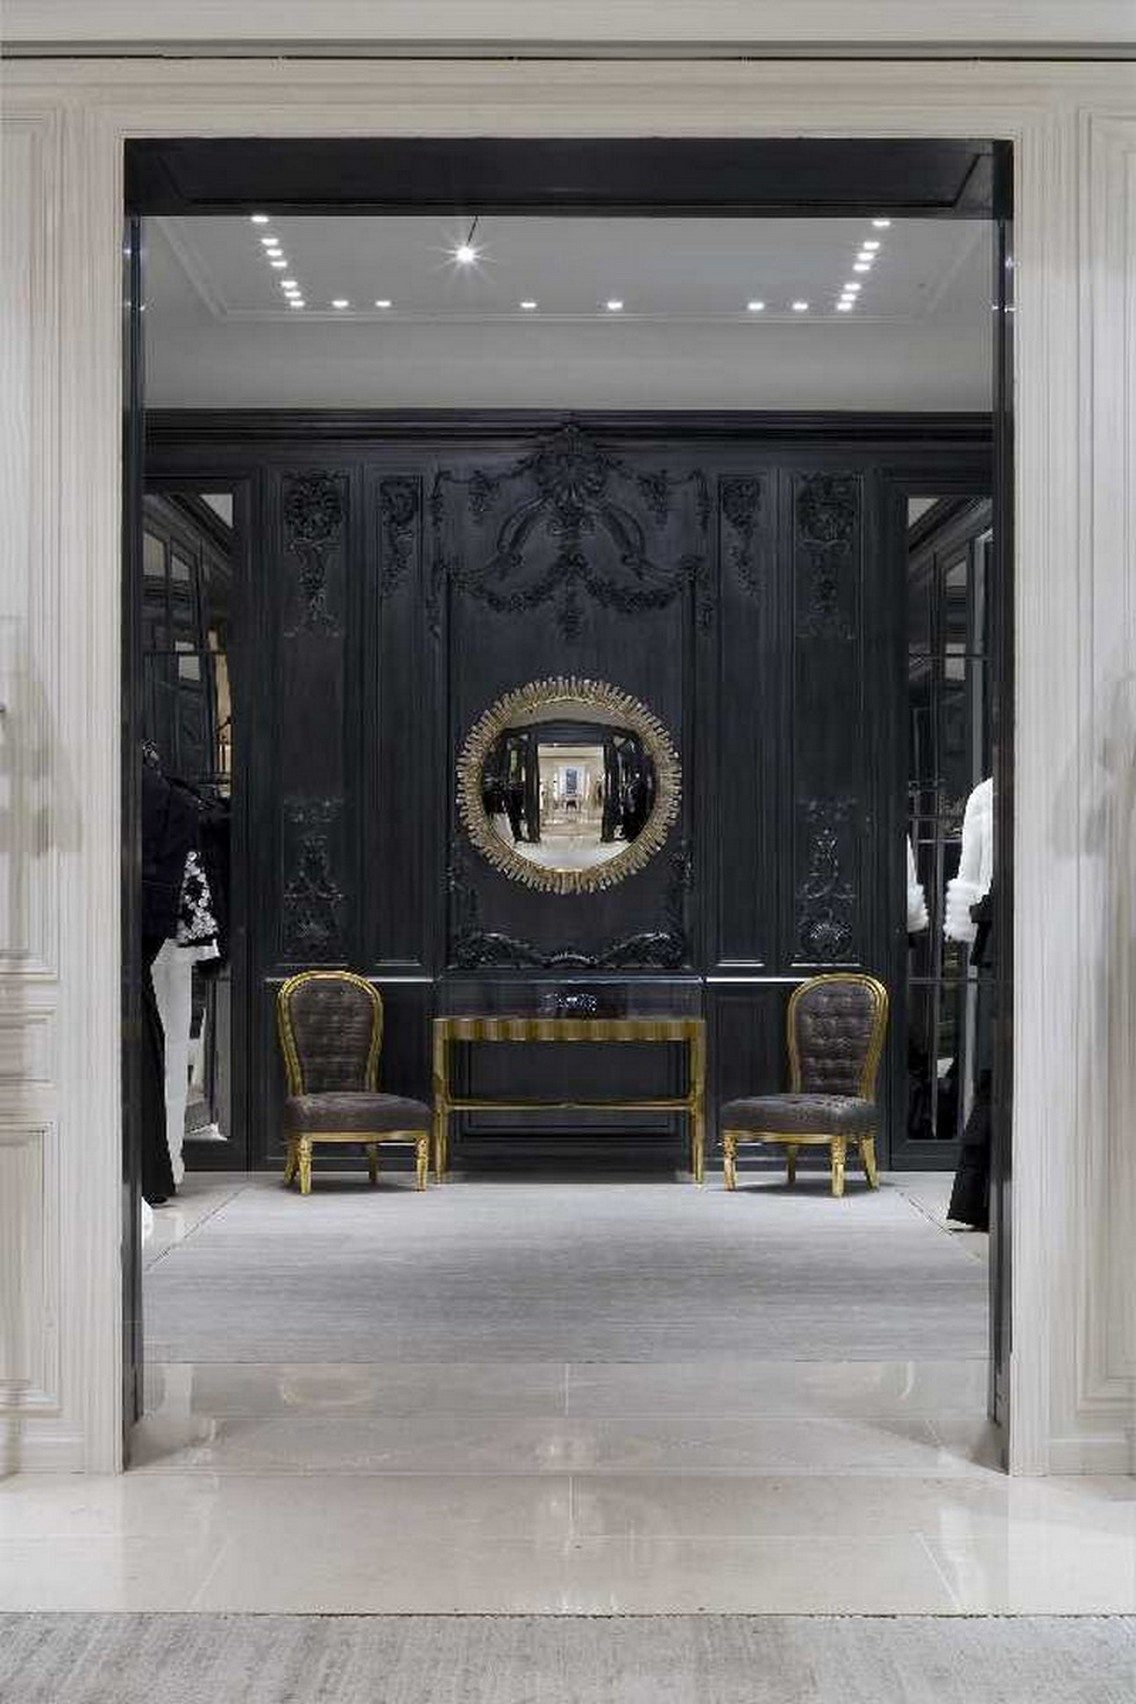 Milan Design Agenda honors Italian 2014 AD100 list Peter Marino